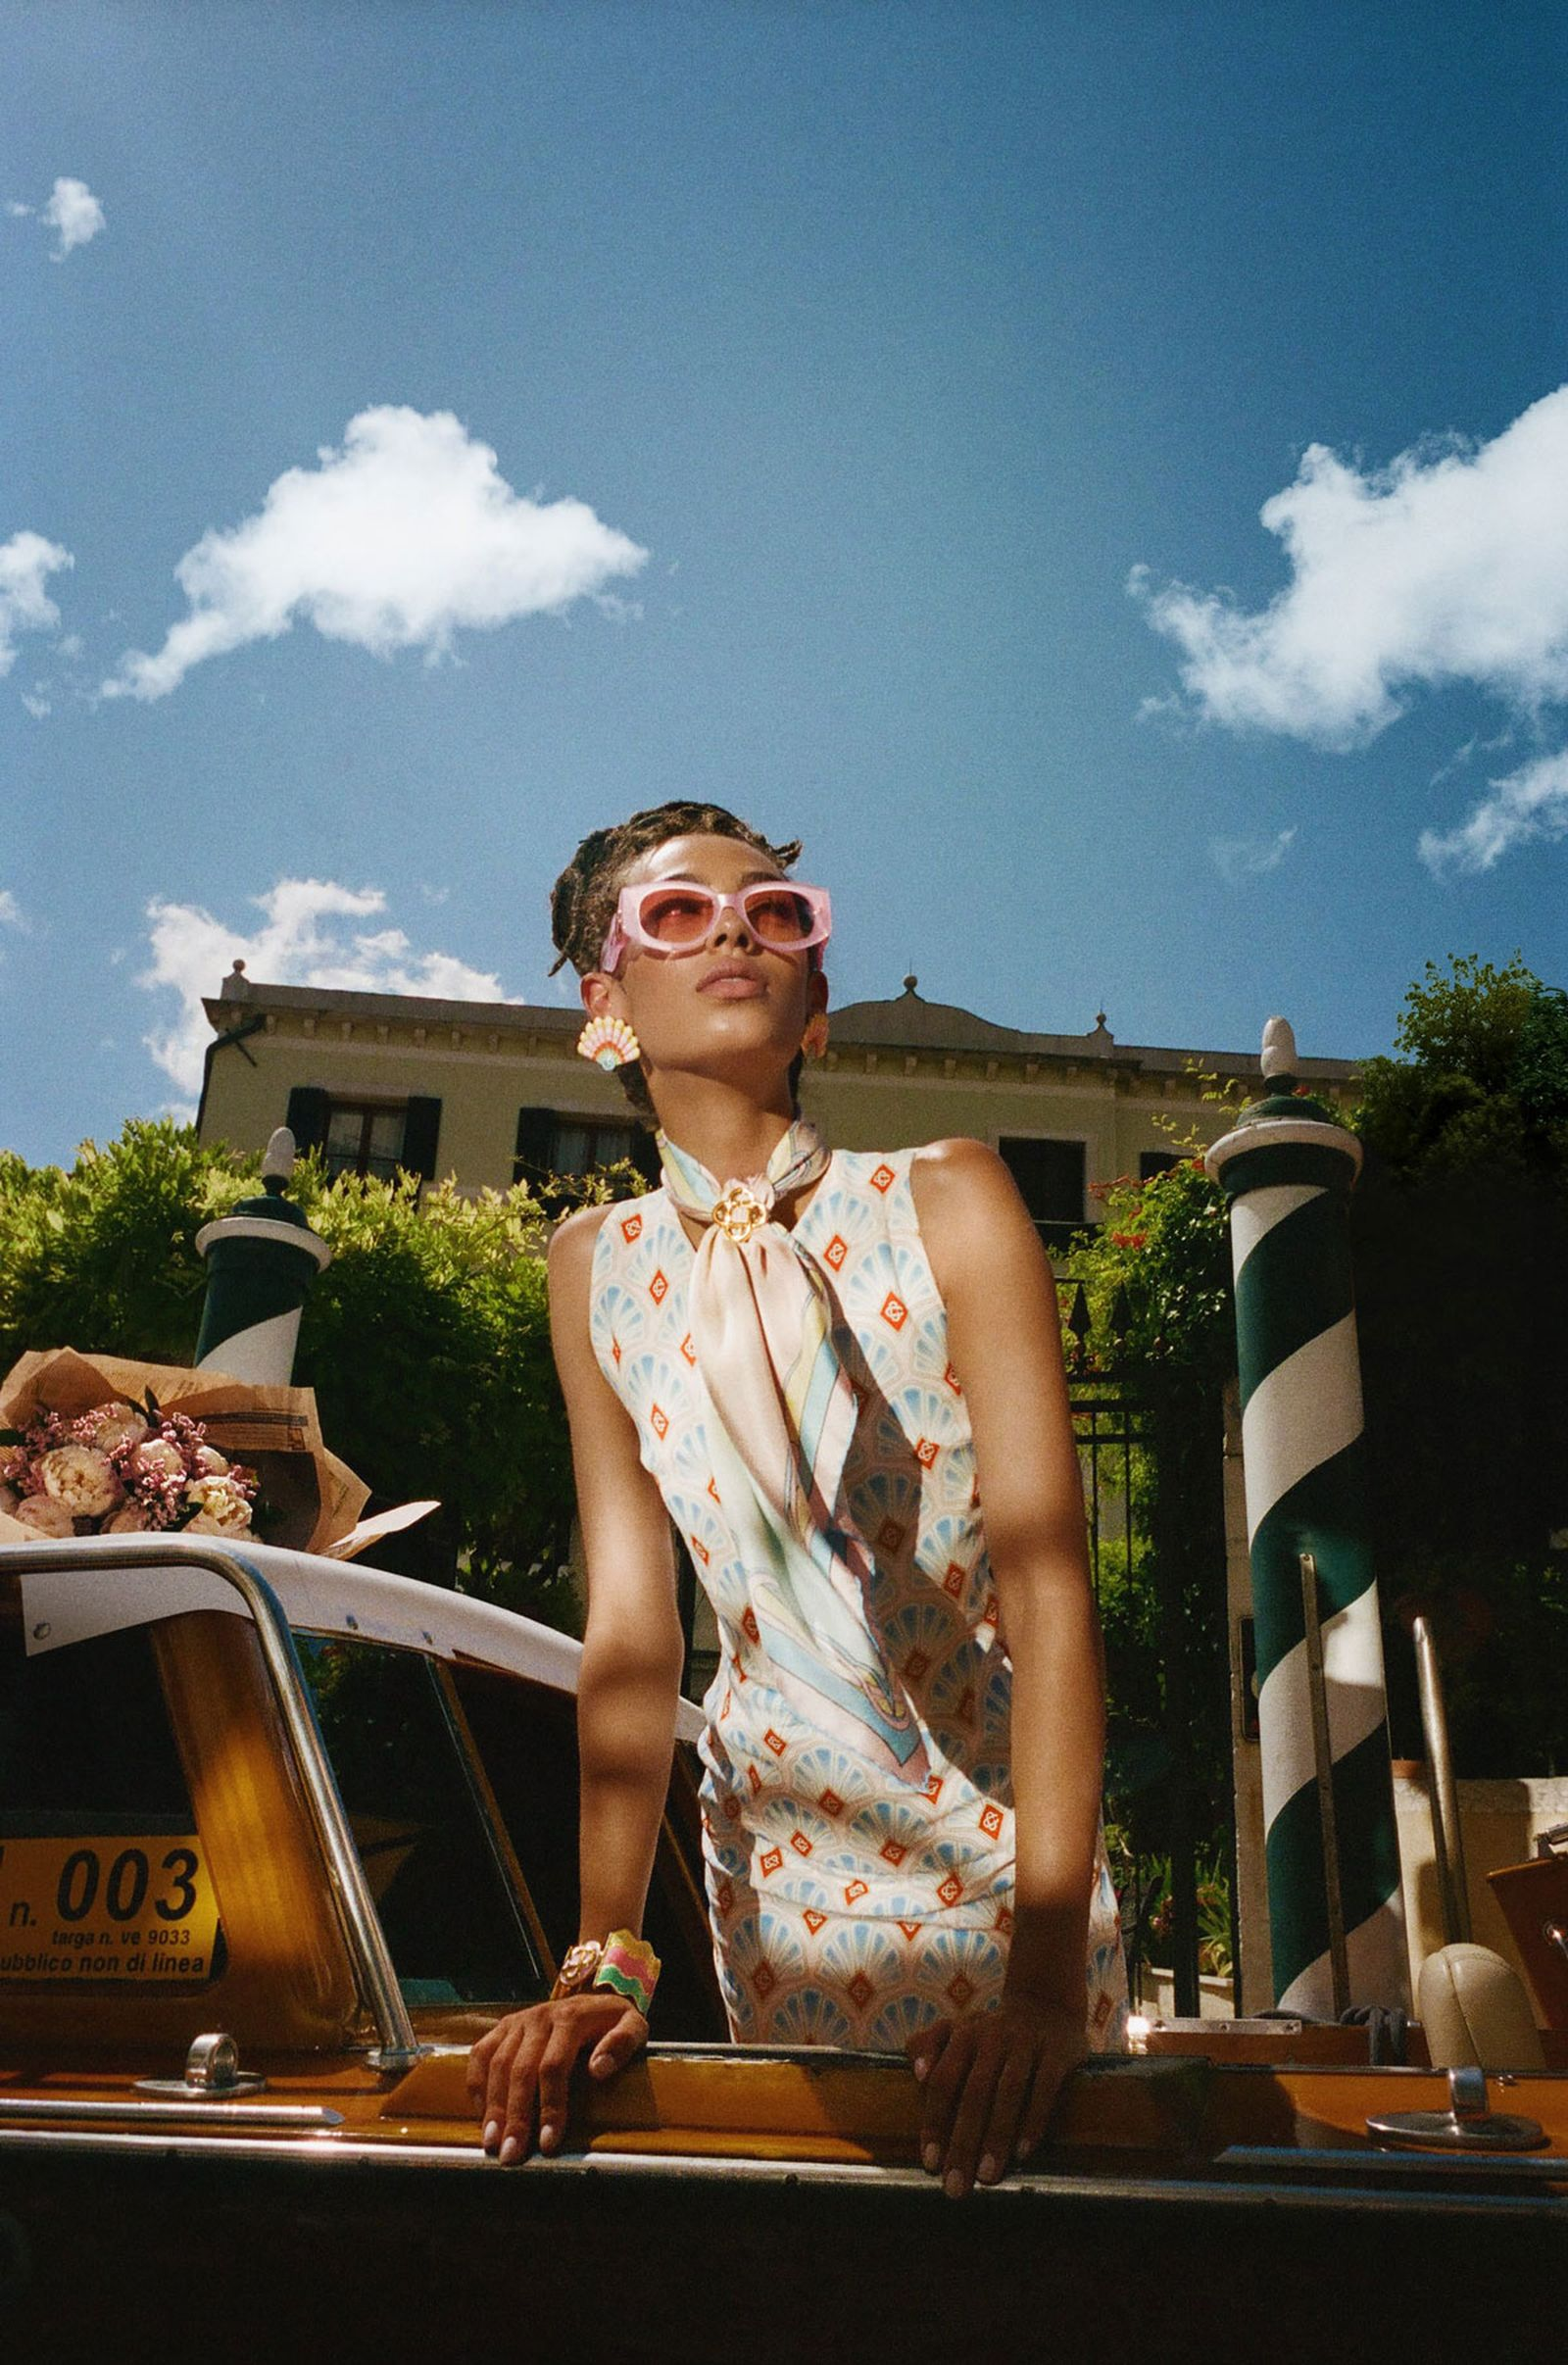 Casa-AW21-Venice---Retouch-priority-Shell-DressV2-min-min